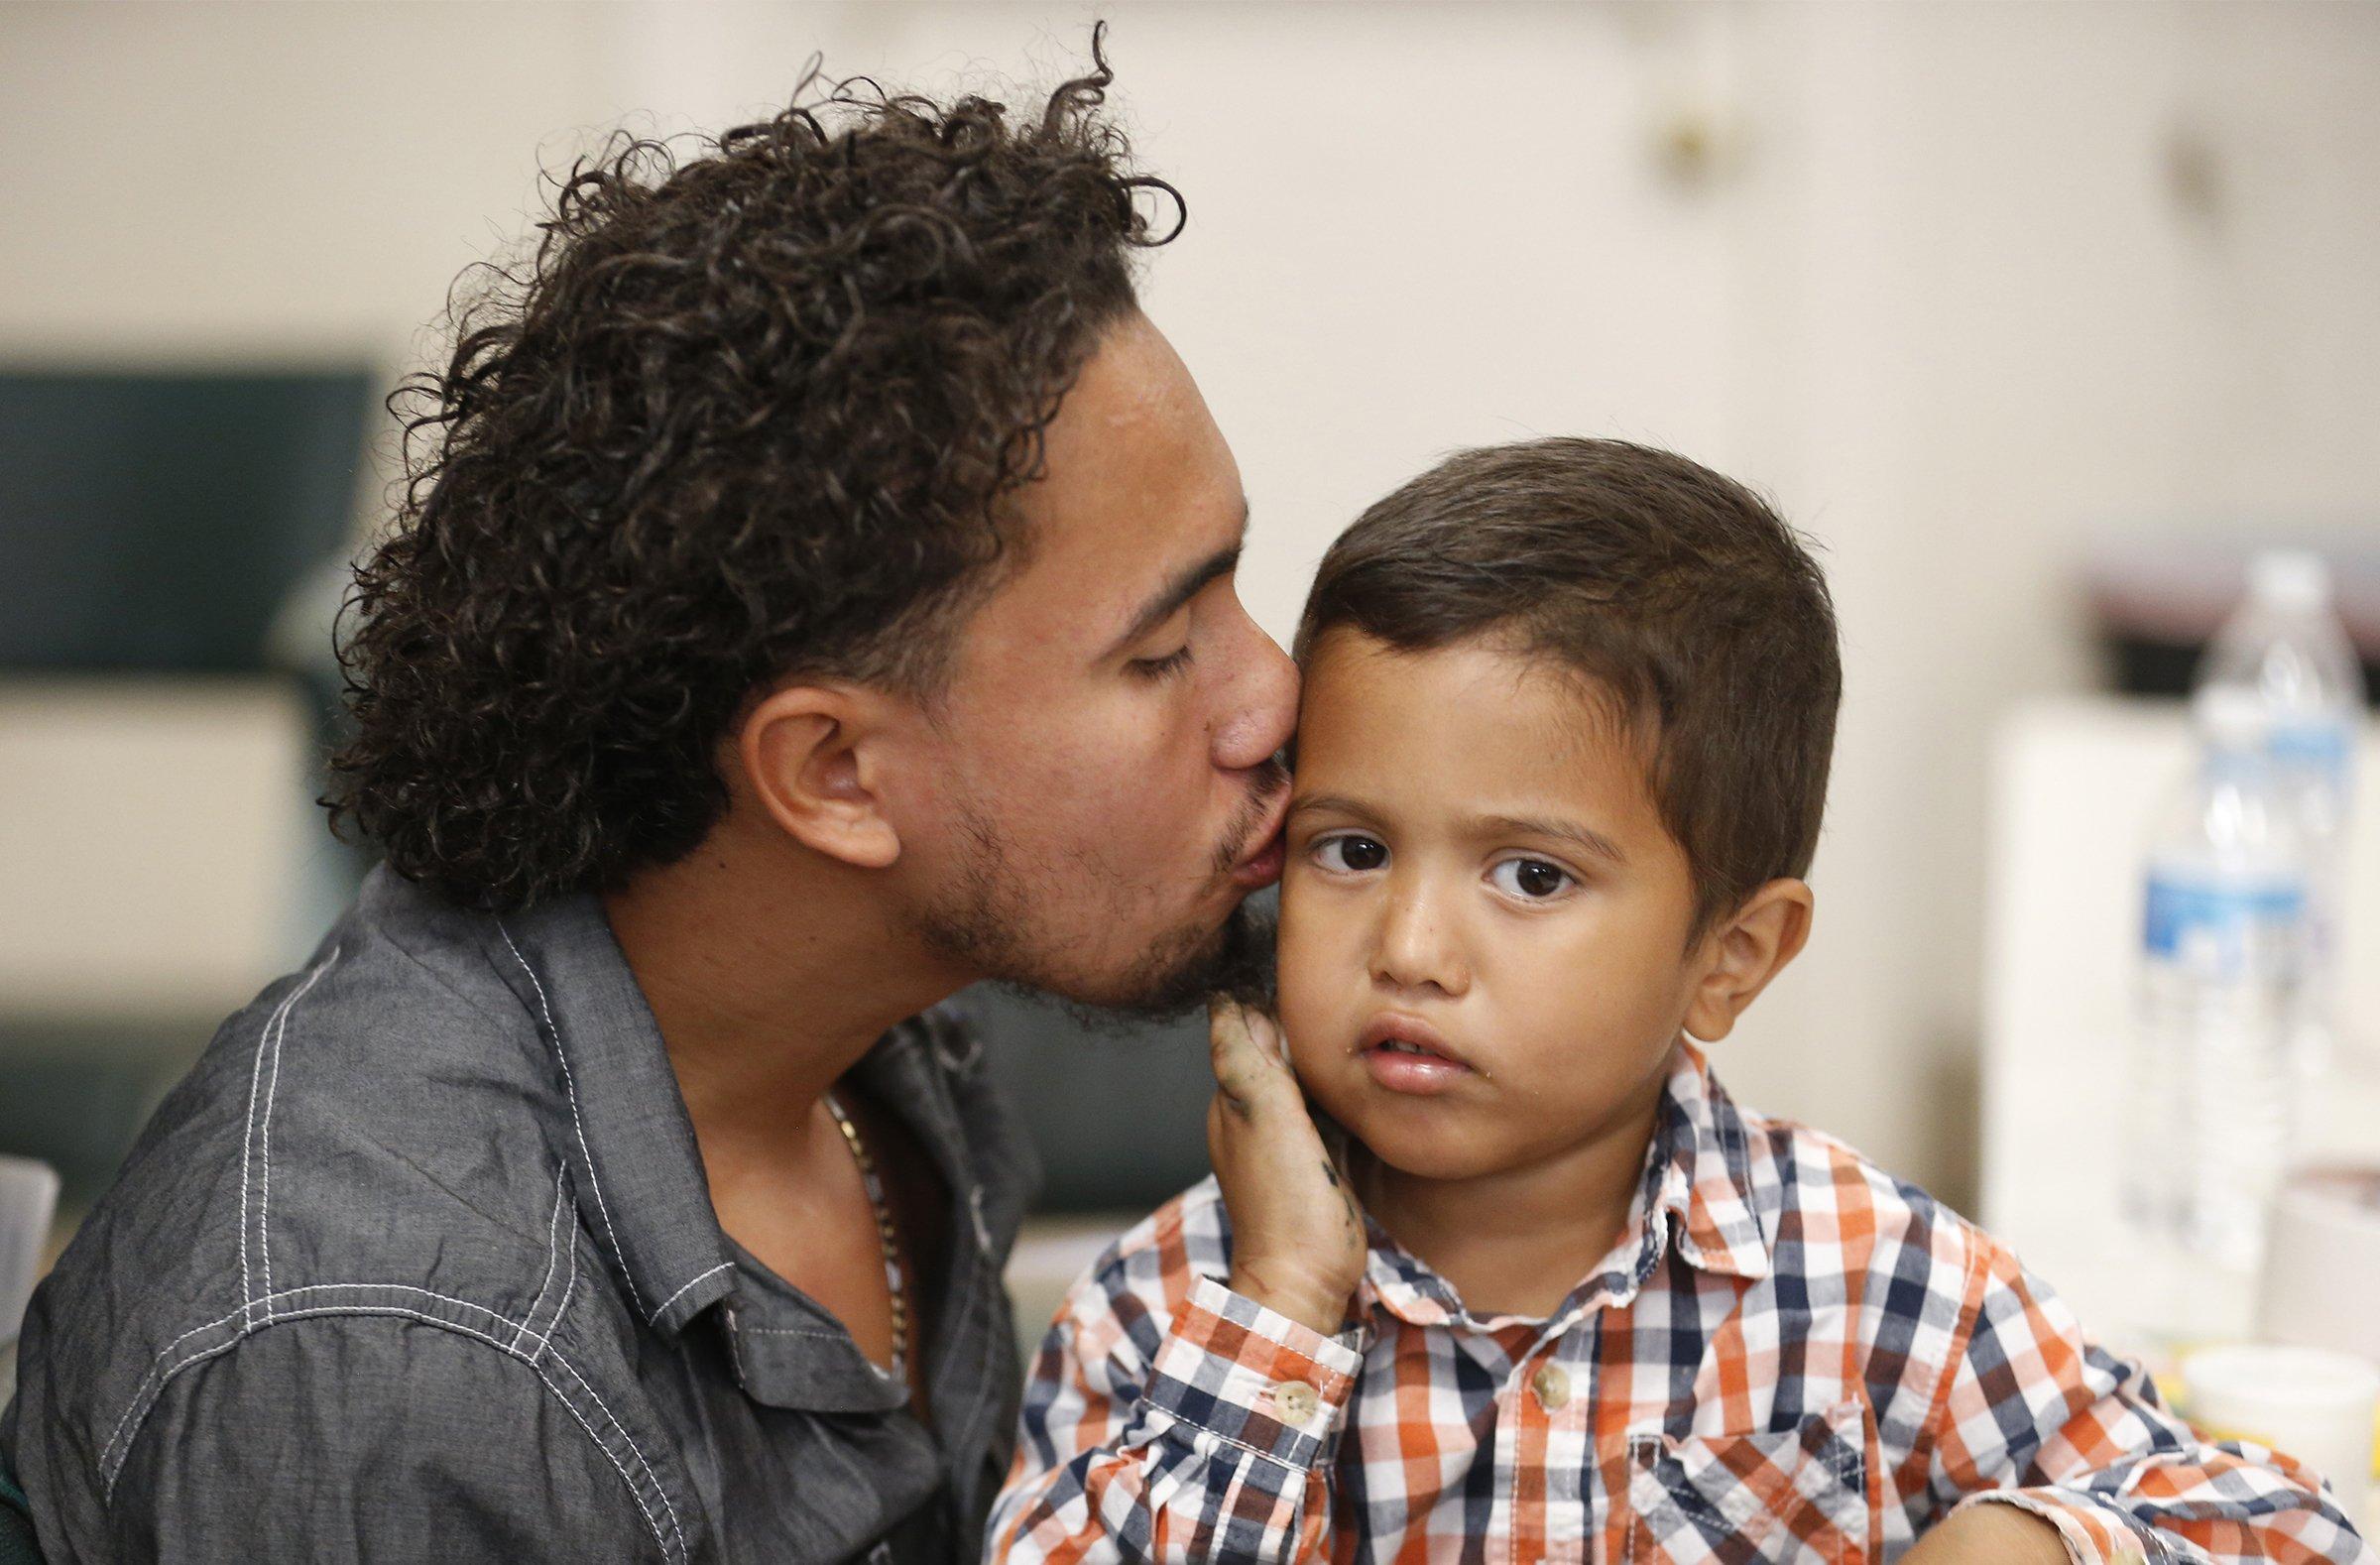 Government falls short of deadline to reunite kids, parents